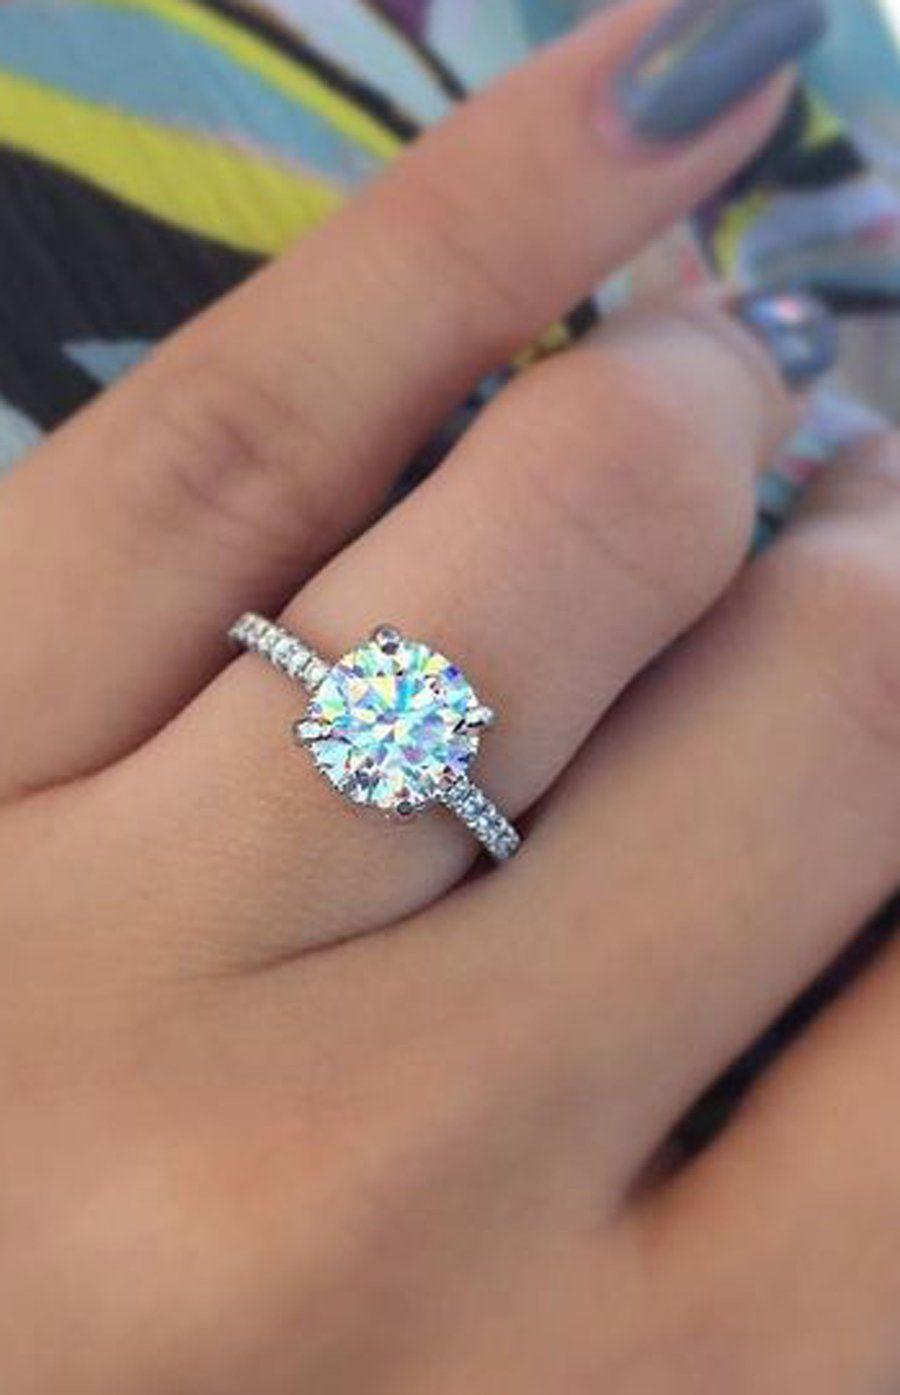 d6237304e629c Camila Medium Ultra Shine Cubic Zirconia Side Accent Crystal ...